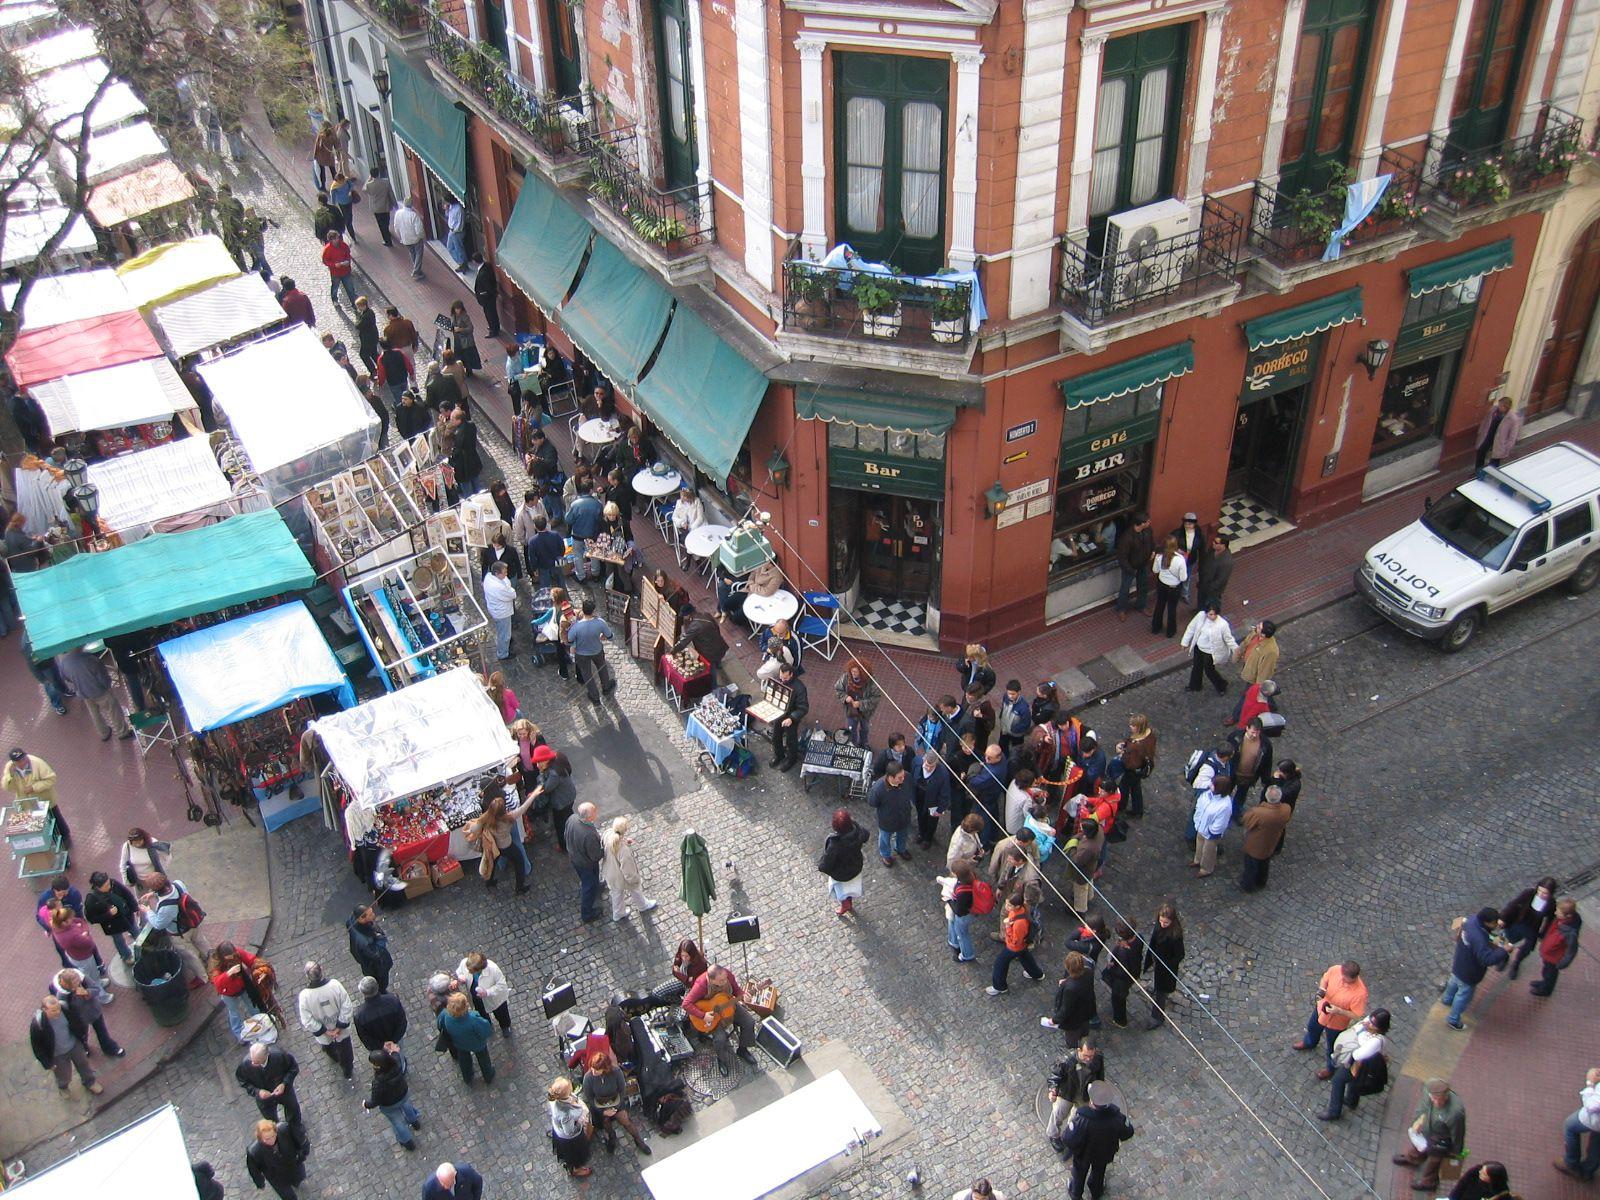 Feria de san telmo antig edades y artesan as for Casa de diseno san telmo